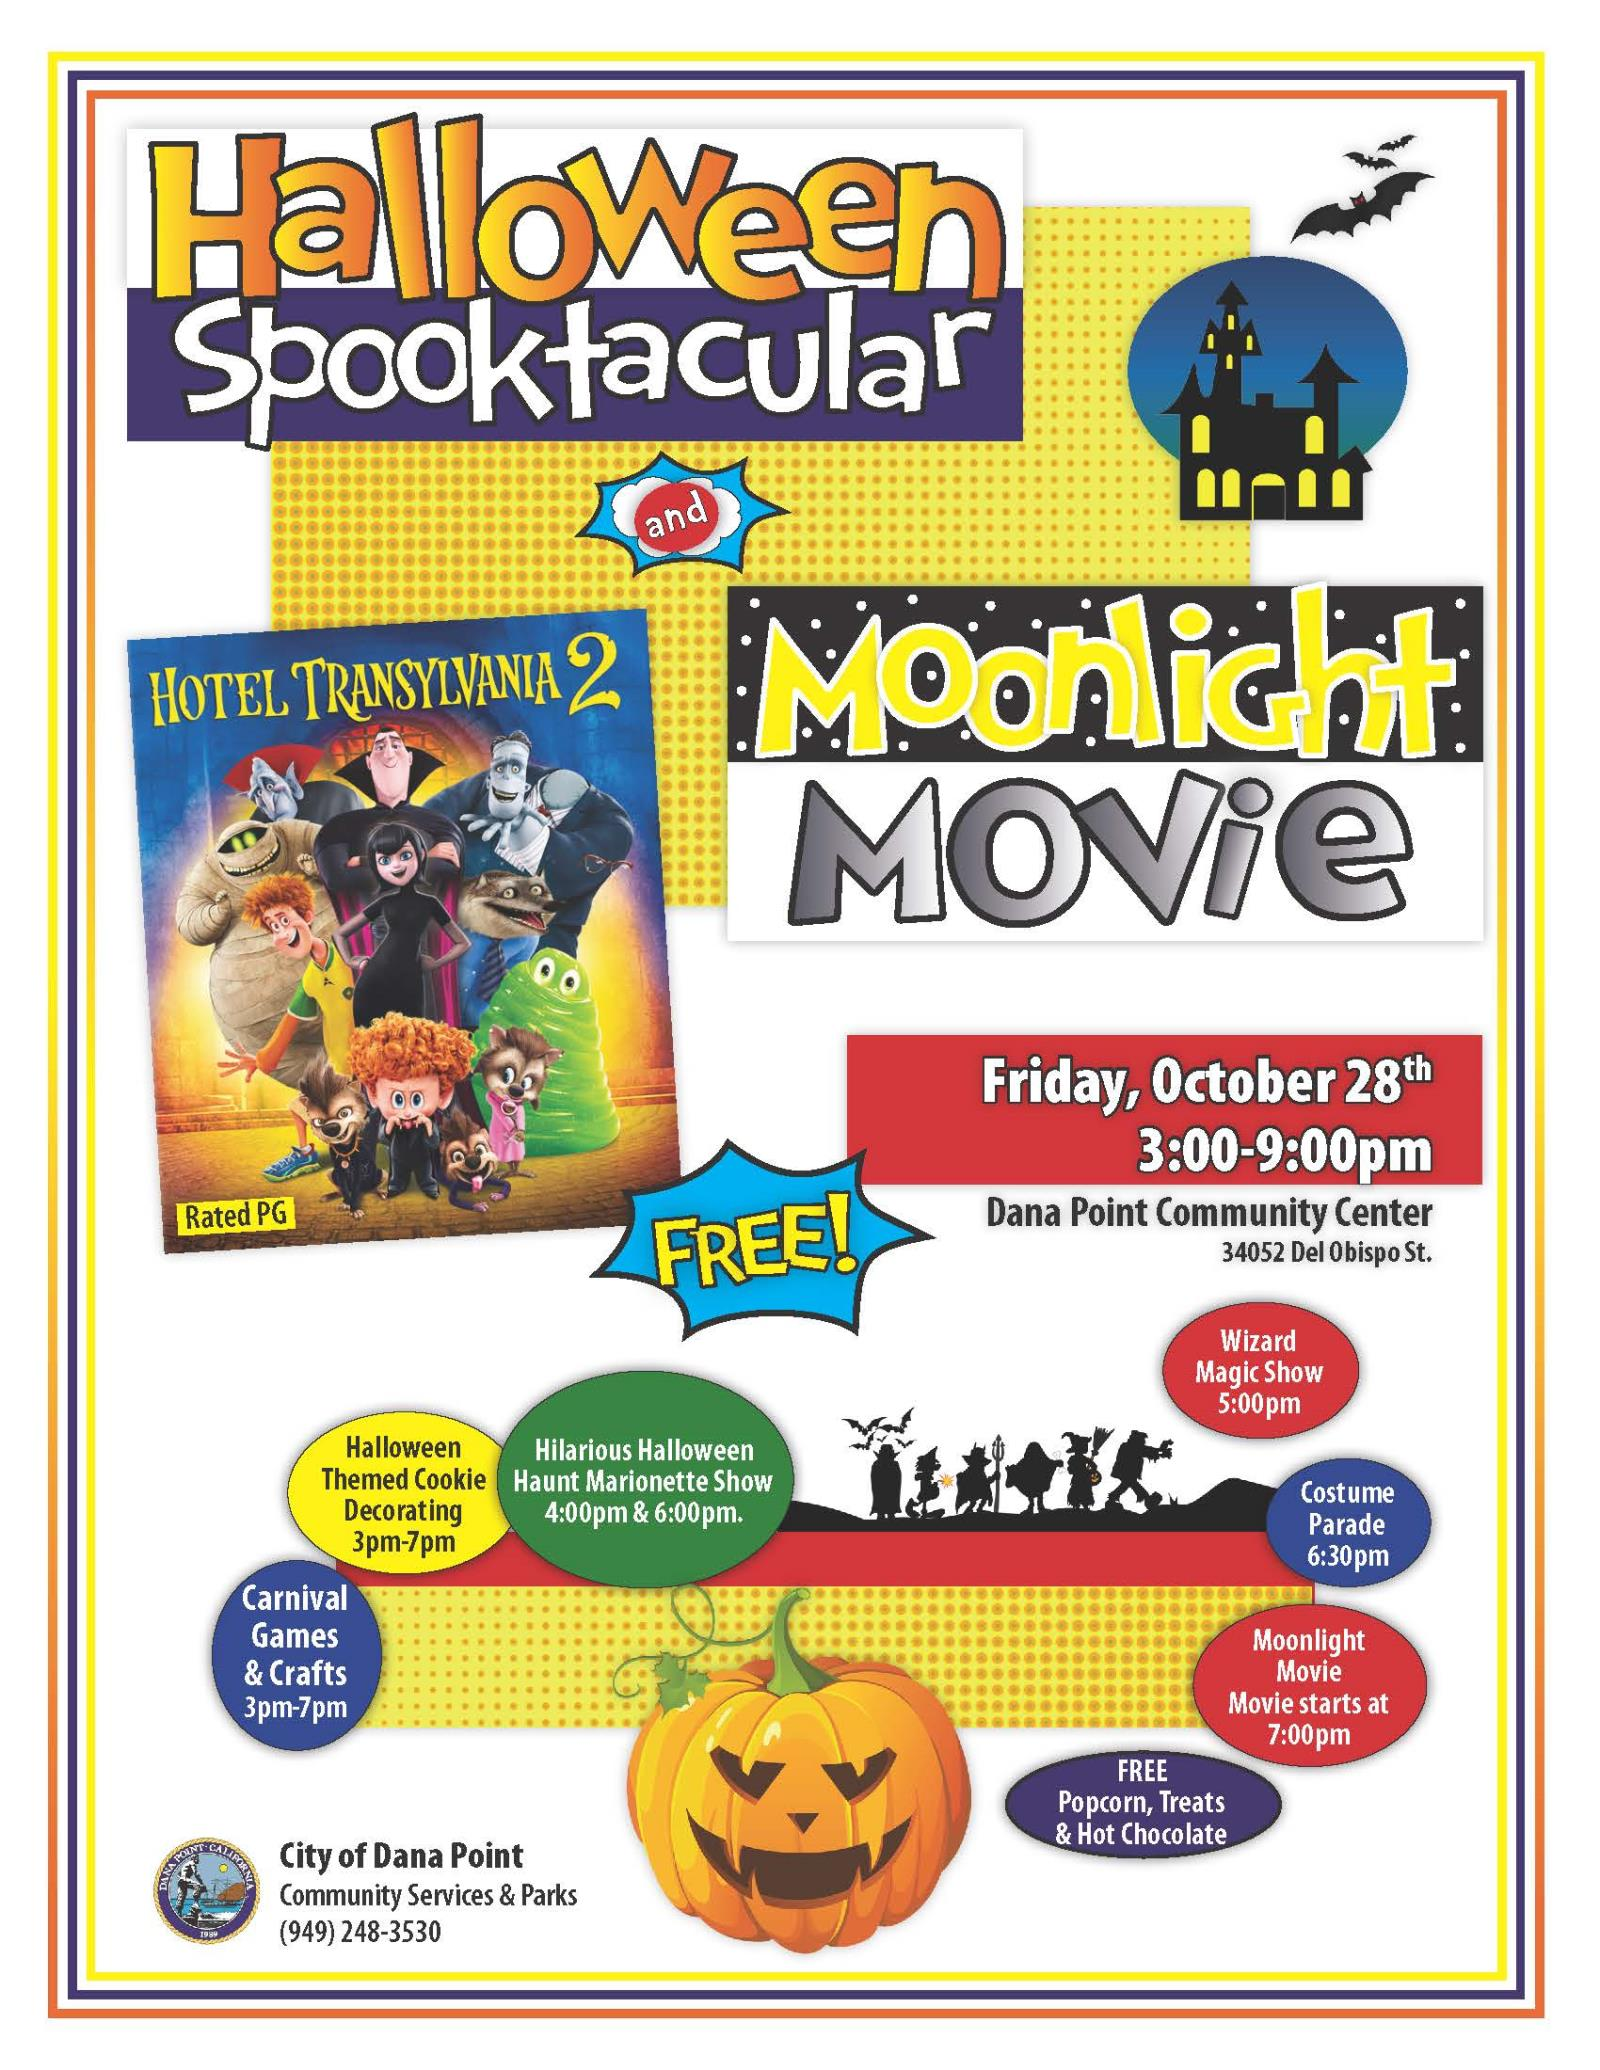 Halloween Spooktacular Movie.Halloween Spooktacular And Moonlight Movie Calendar City